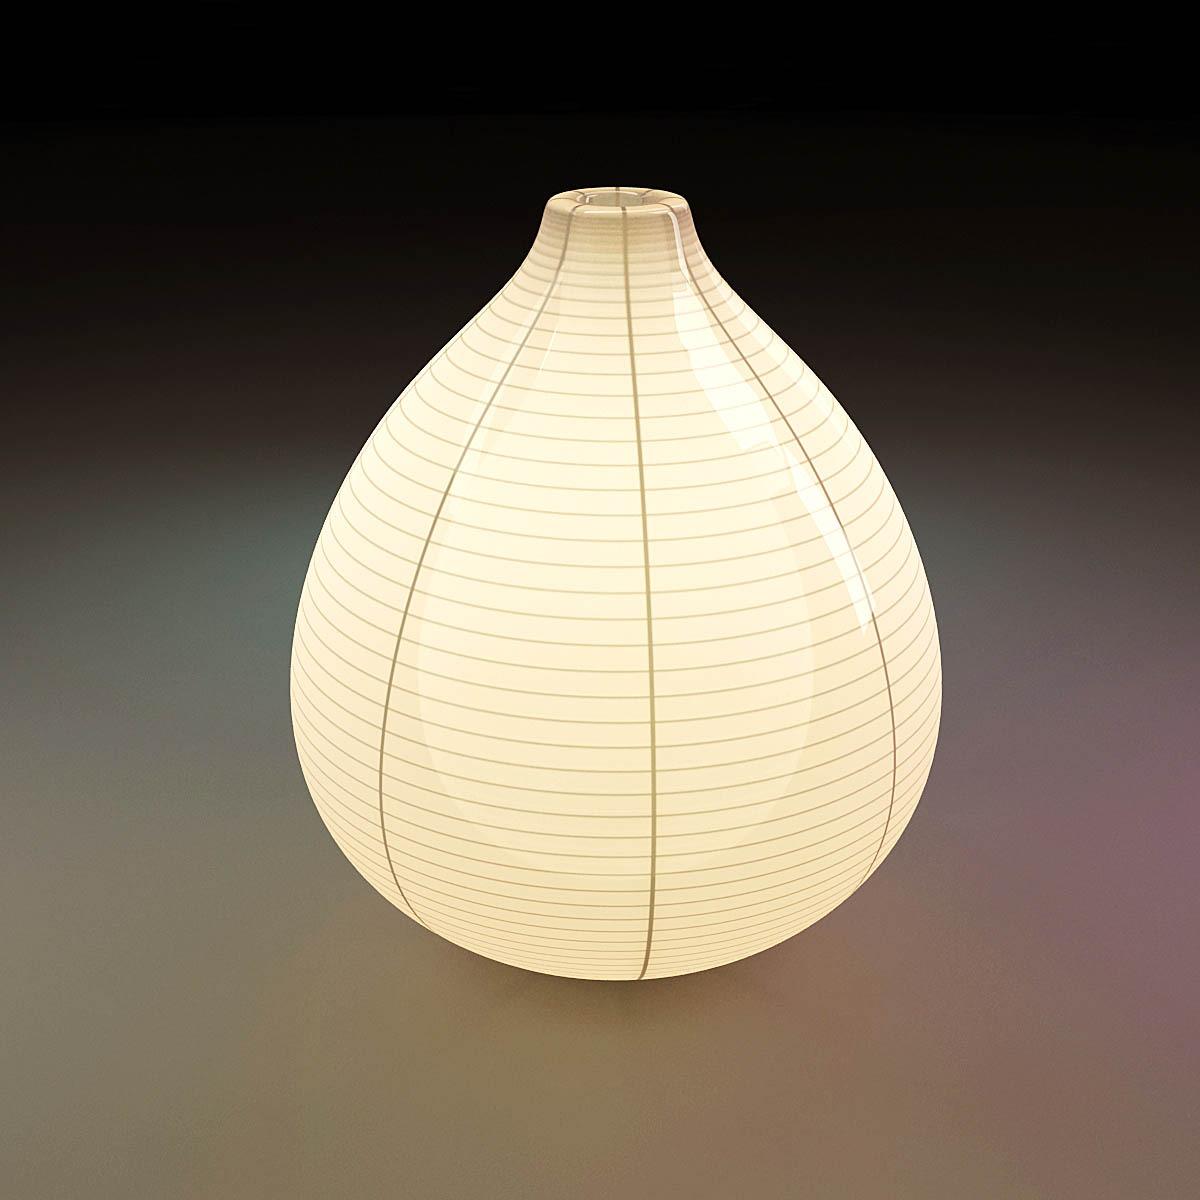 Ikea table lamps 10 in 1 by sercancetin 3docean kajuta 2g kajutag klabb 2g klabbg lampan 2g lampang naturel 2g naturelg stockholm 2g stockholmg vate 2g geotapseo Image collections